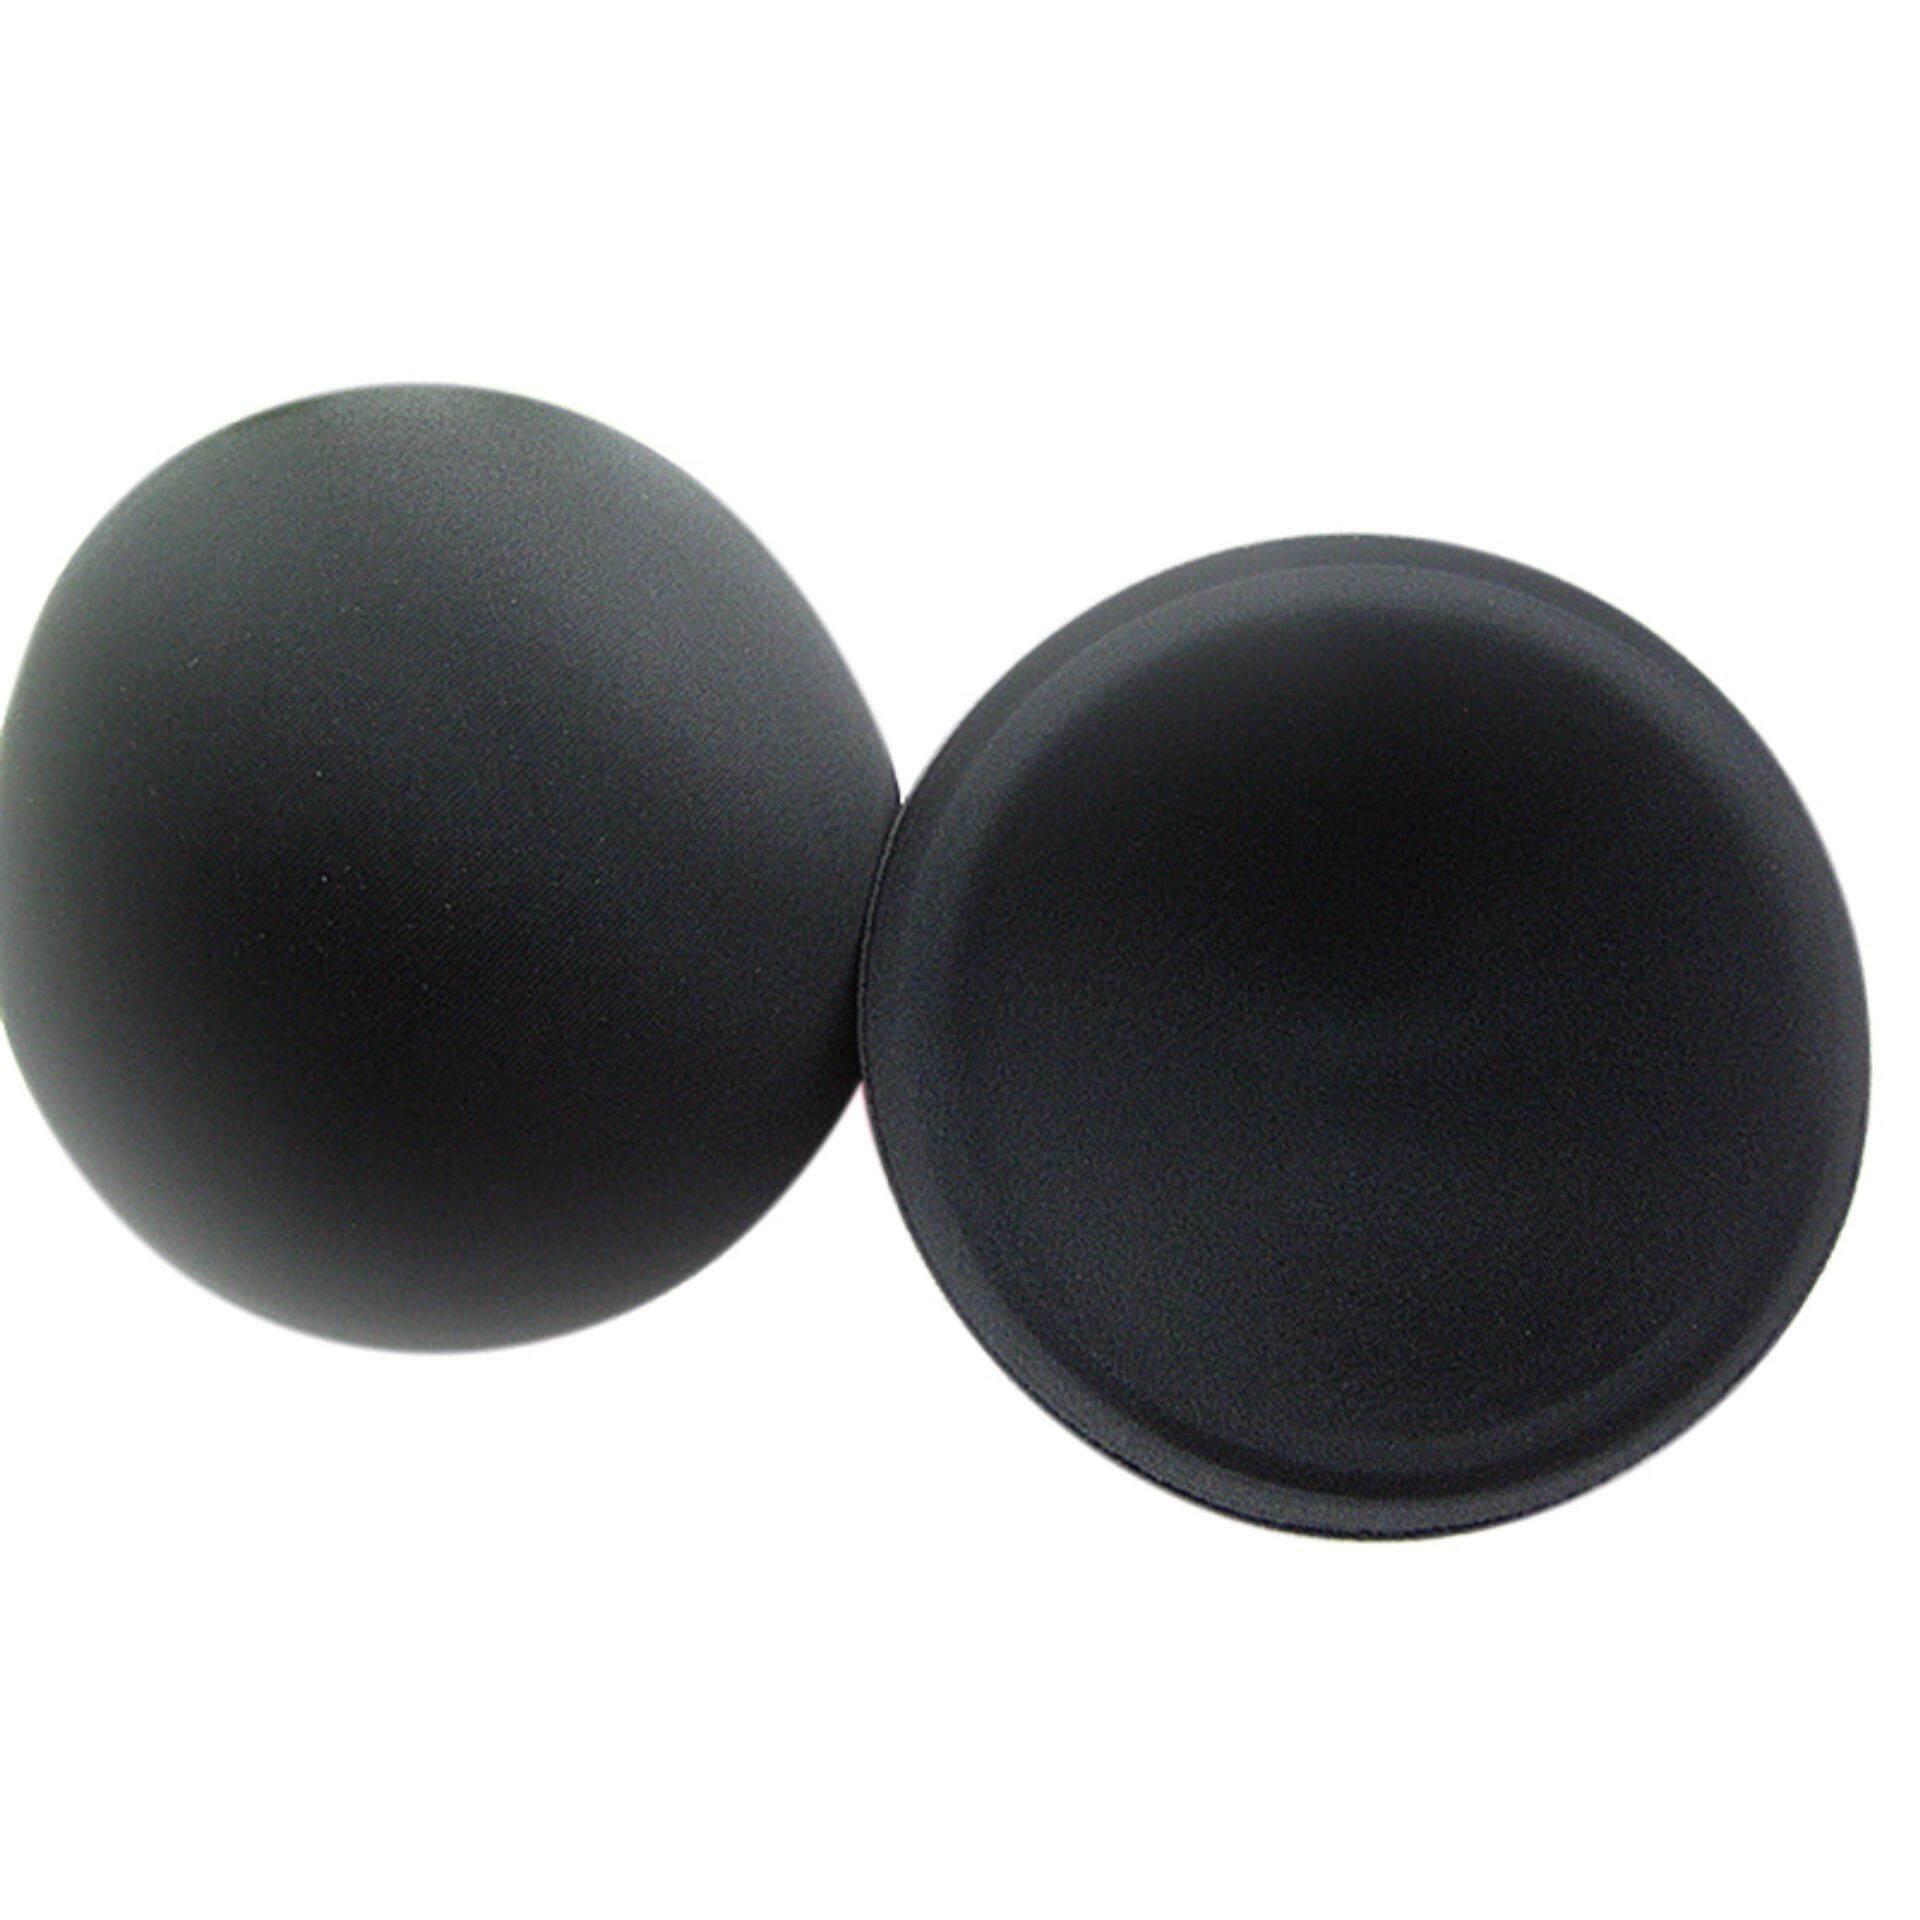 Foam Bra Insert Pads Round Full Cup Bikini Swimsuit Breast Enhancer Push Up Black